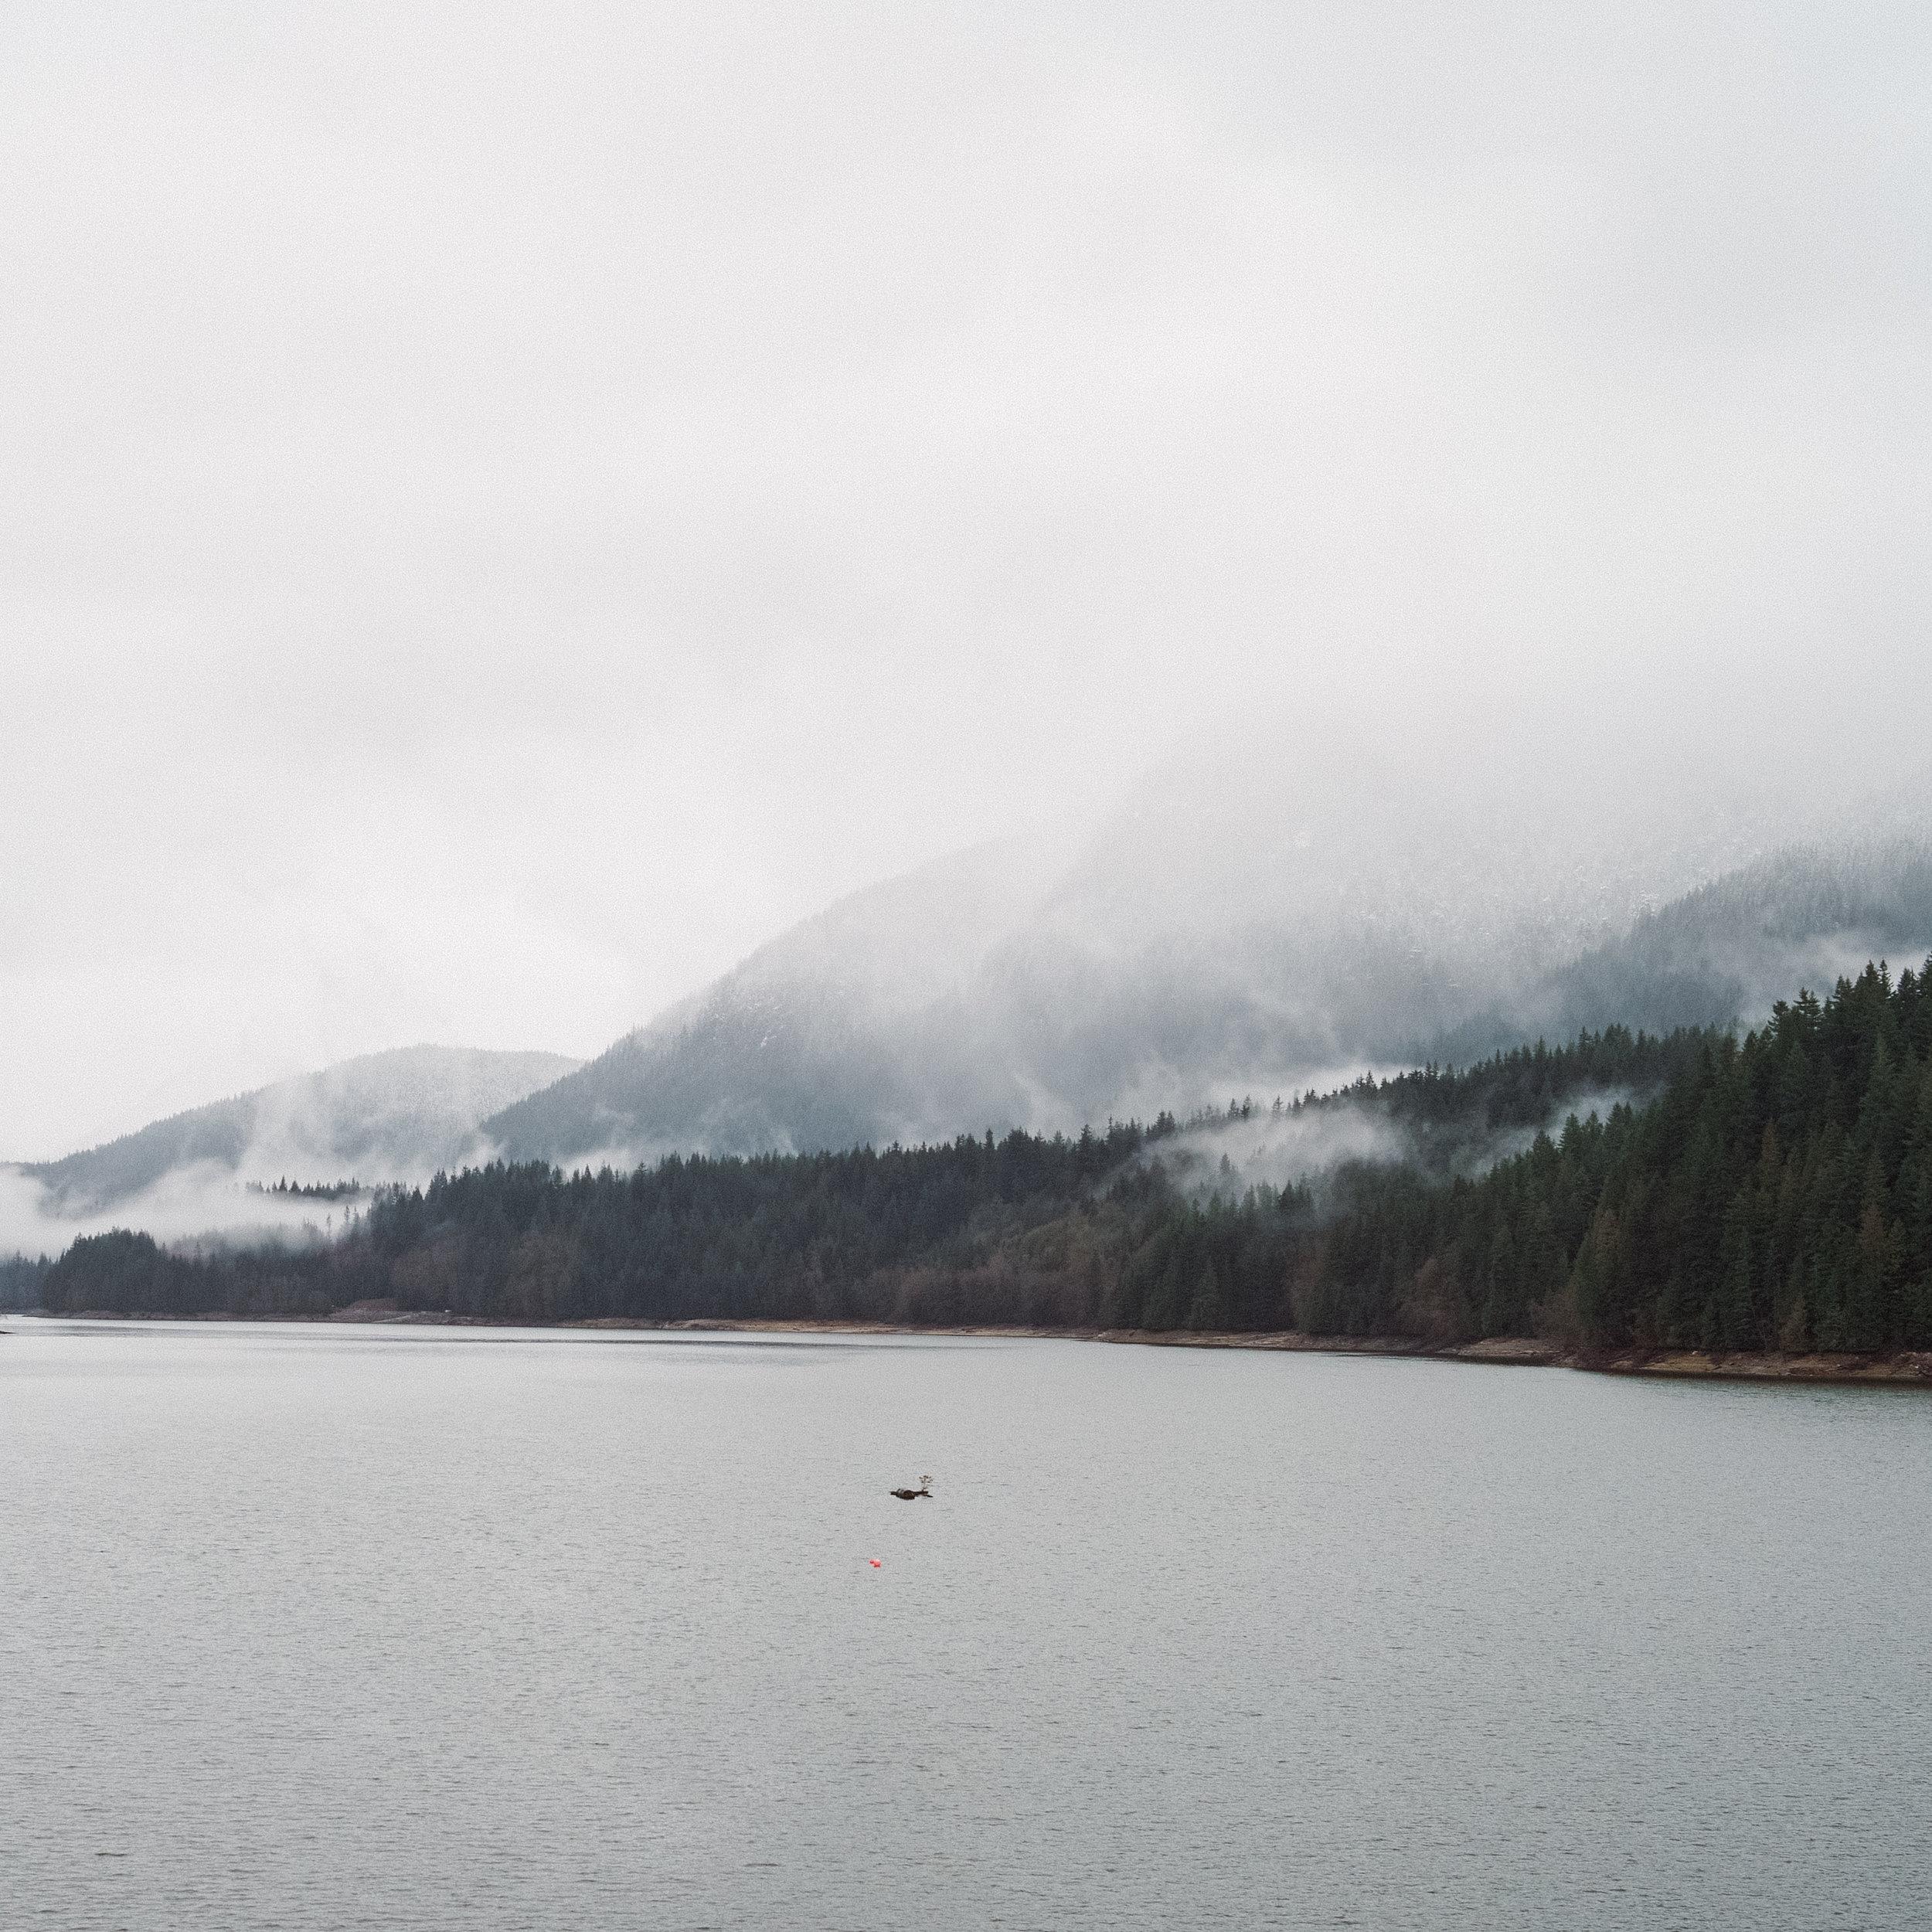 2018-12-30 cleveland dam.jpg